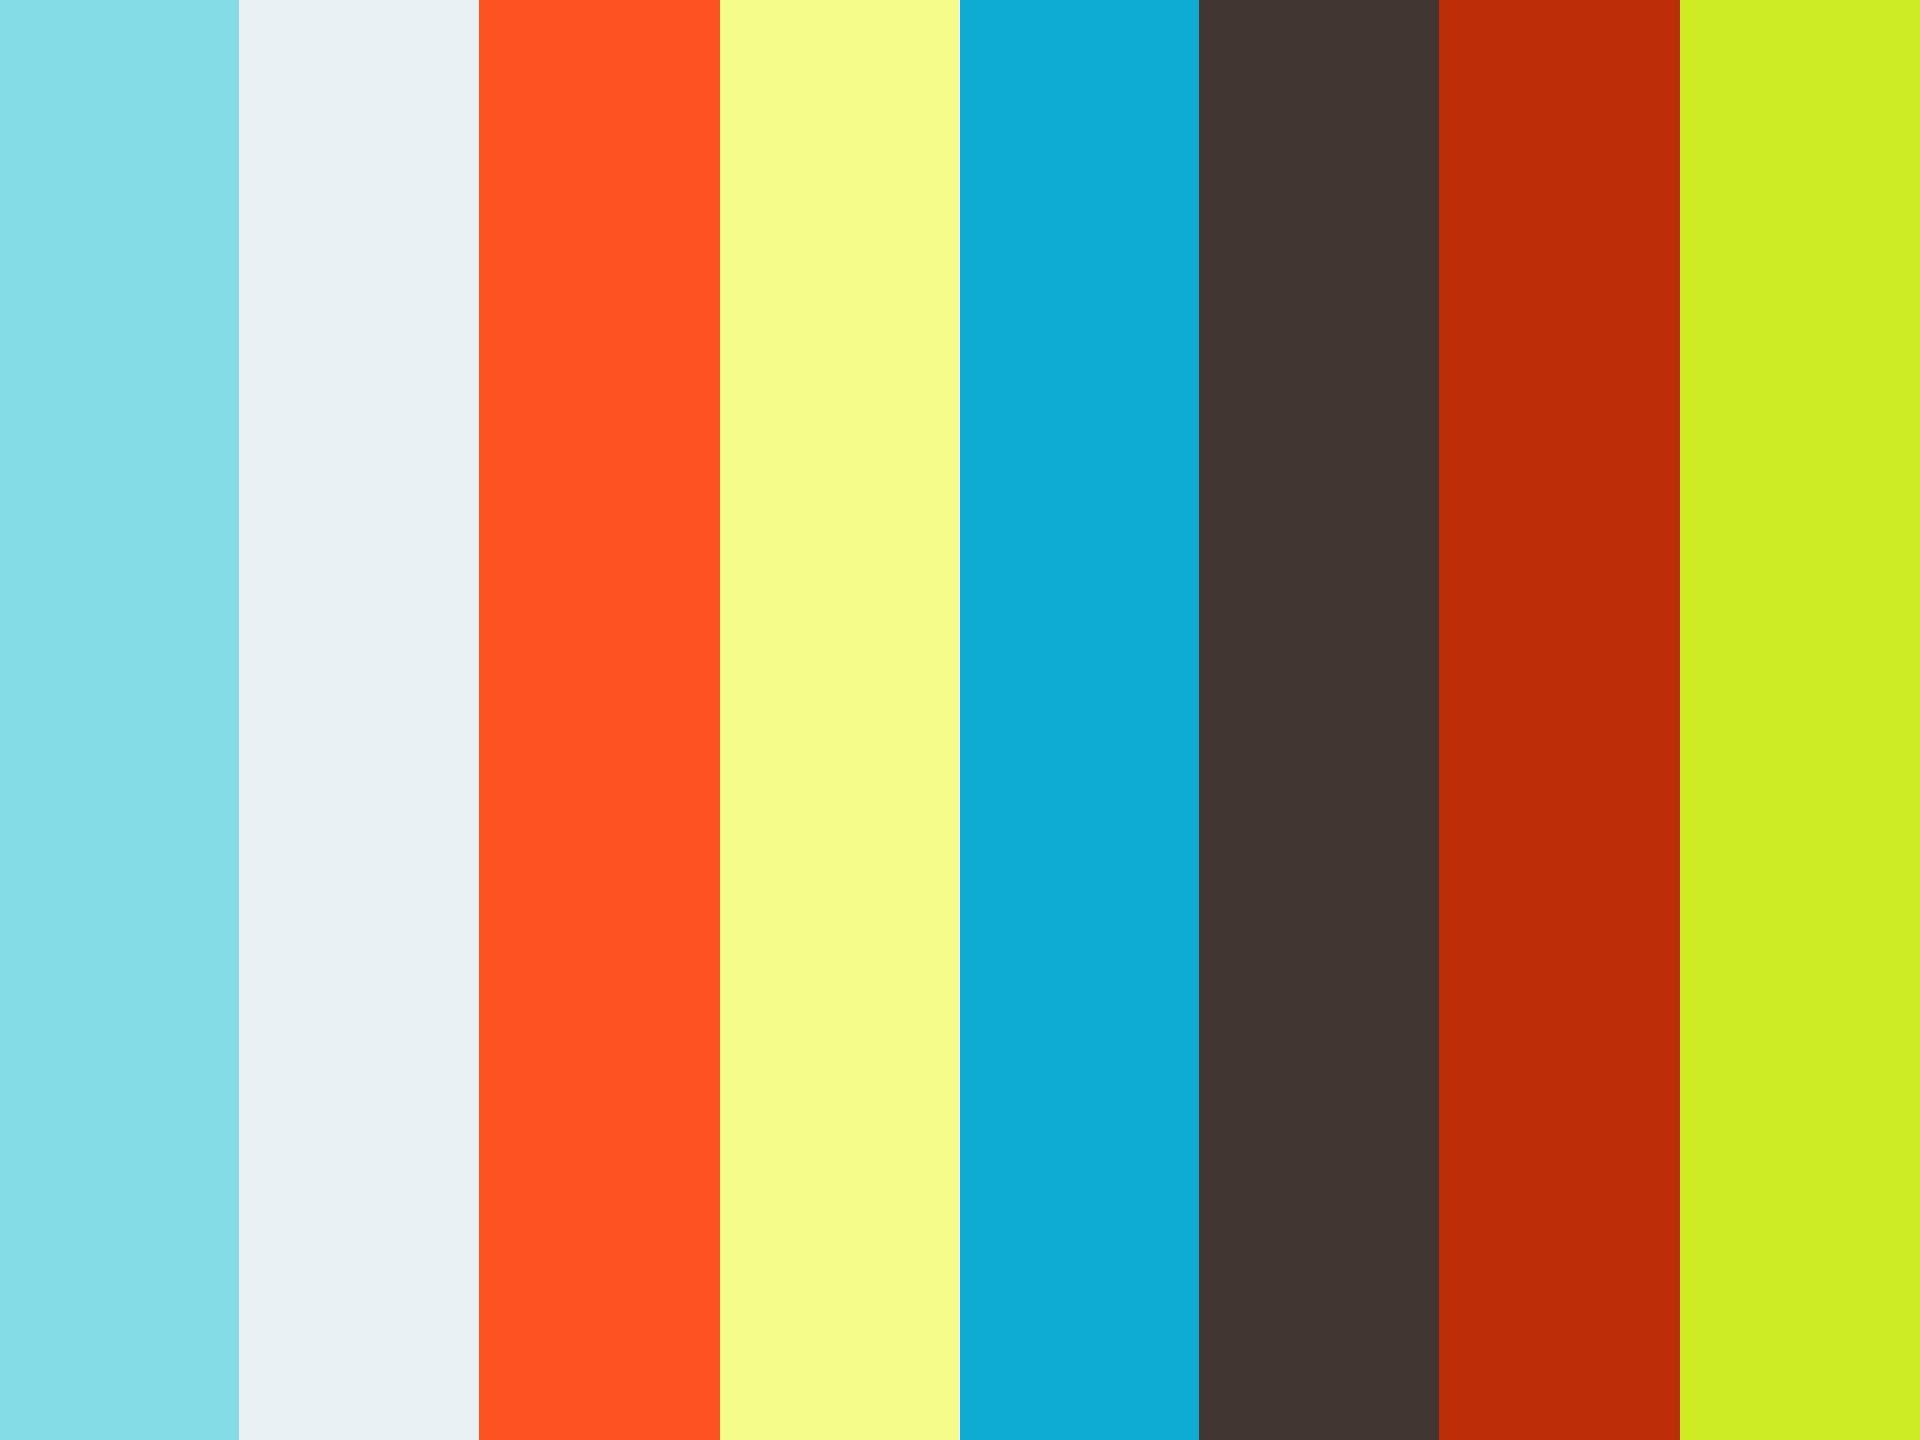 diagram for neptune [ 1280 x 720 Pixel ]